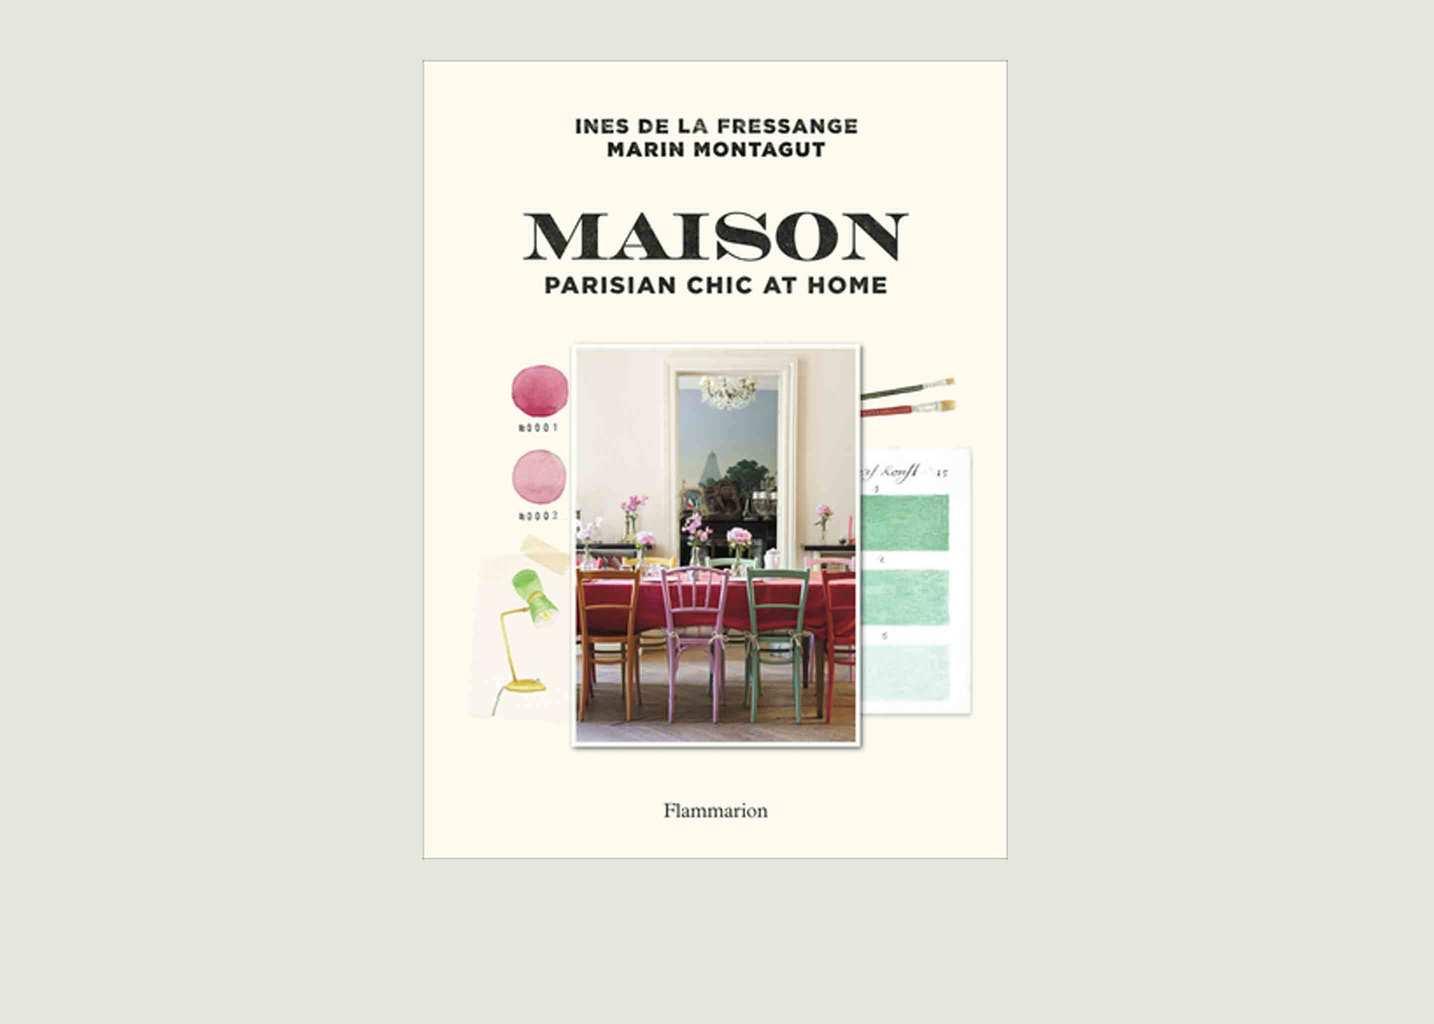 Maison : Parisian Chic at Home - Flammarion